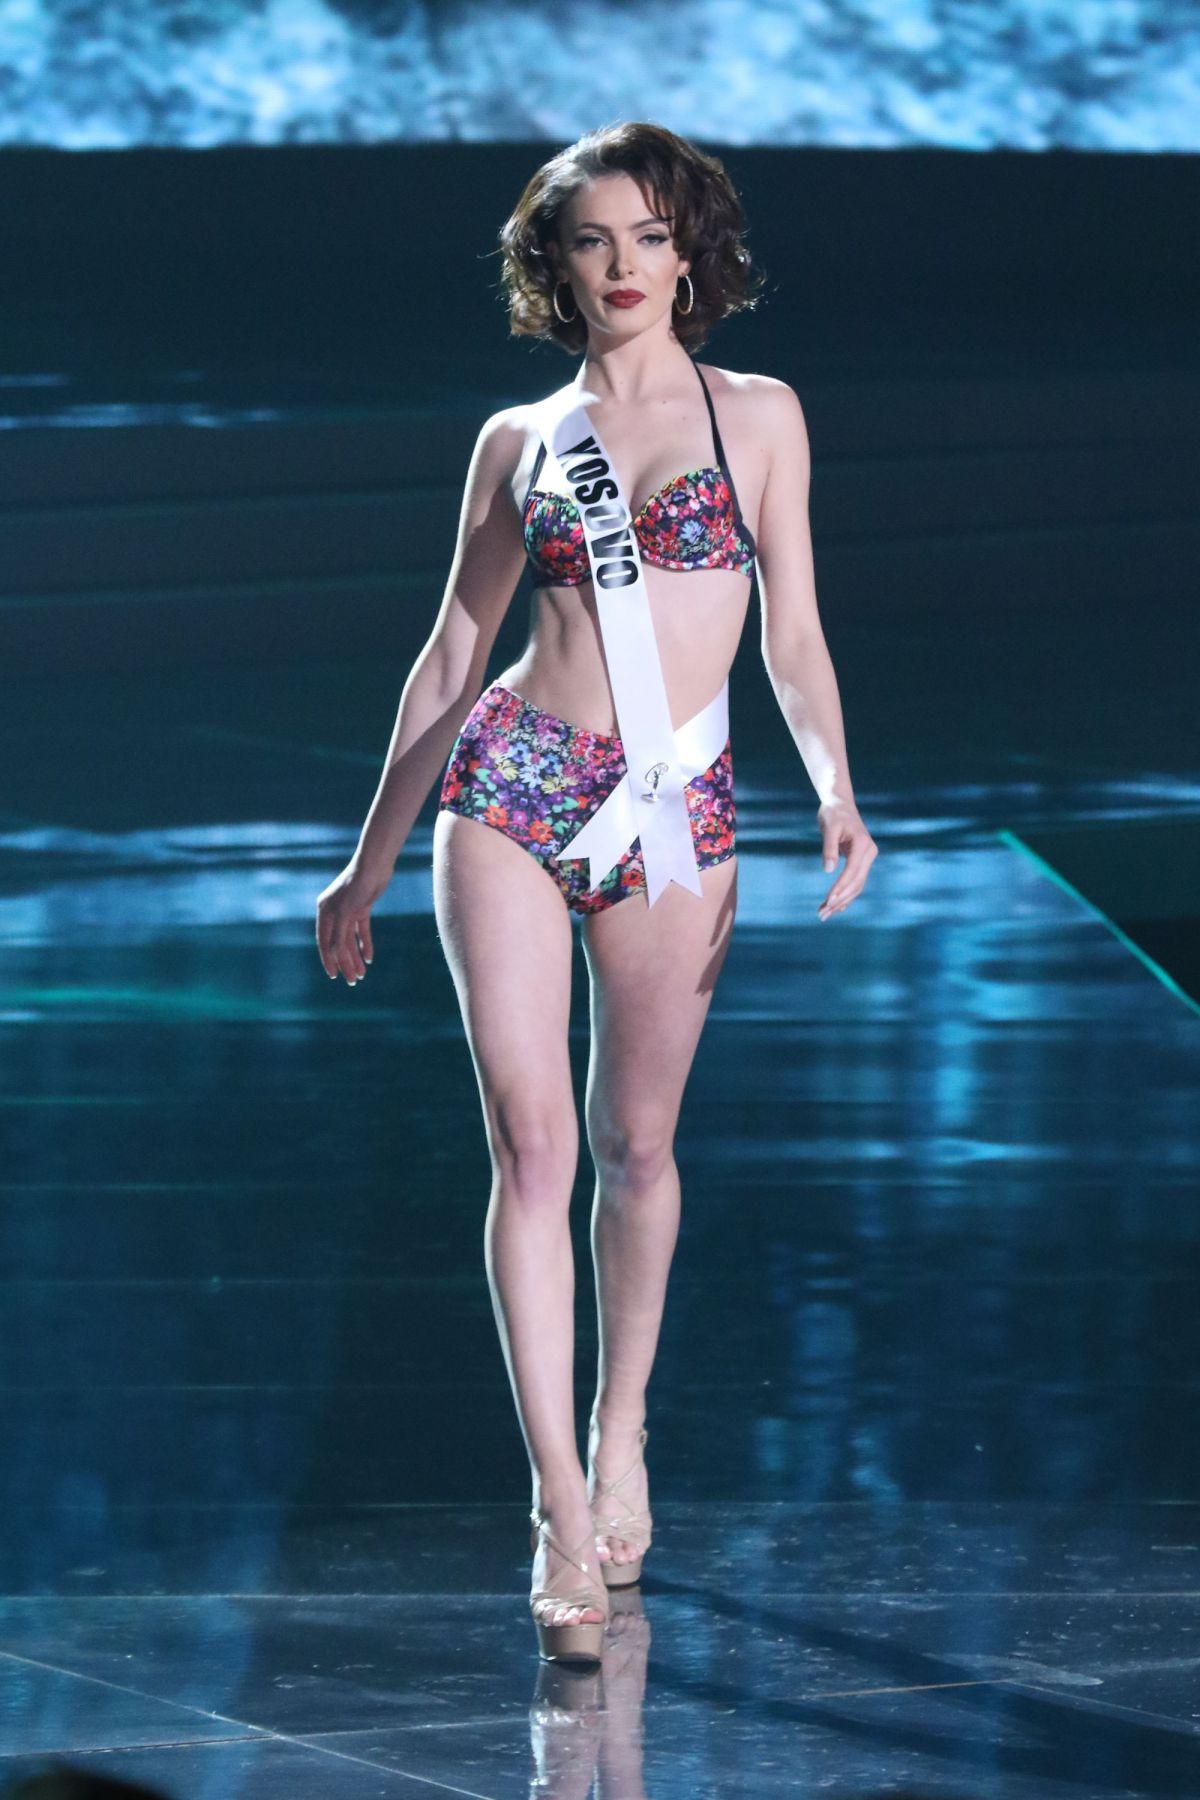 MIRJETA SHALA - Miss Universe 2015 Preliminary Round 12/16/2015